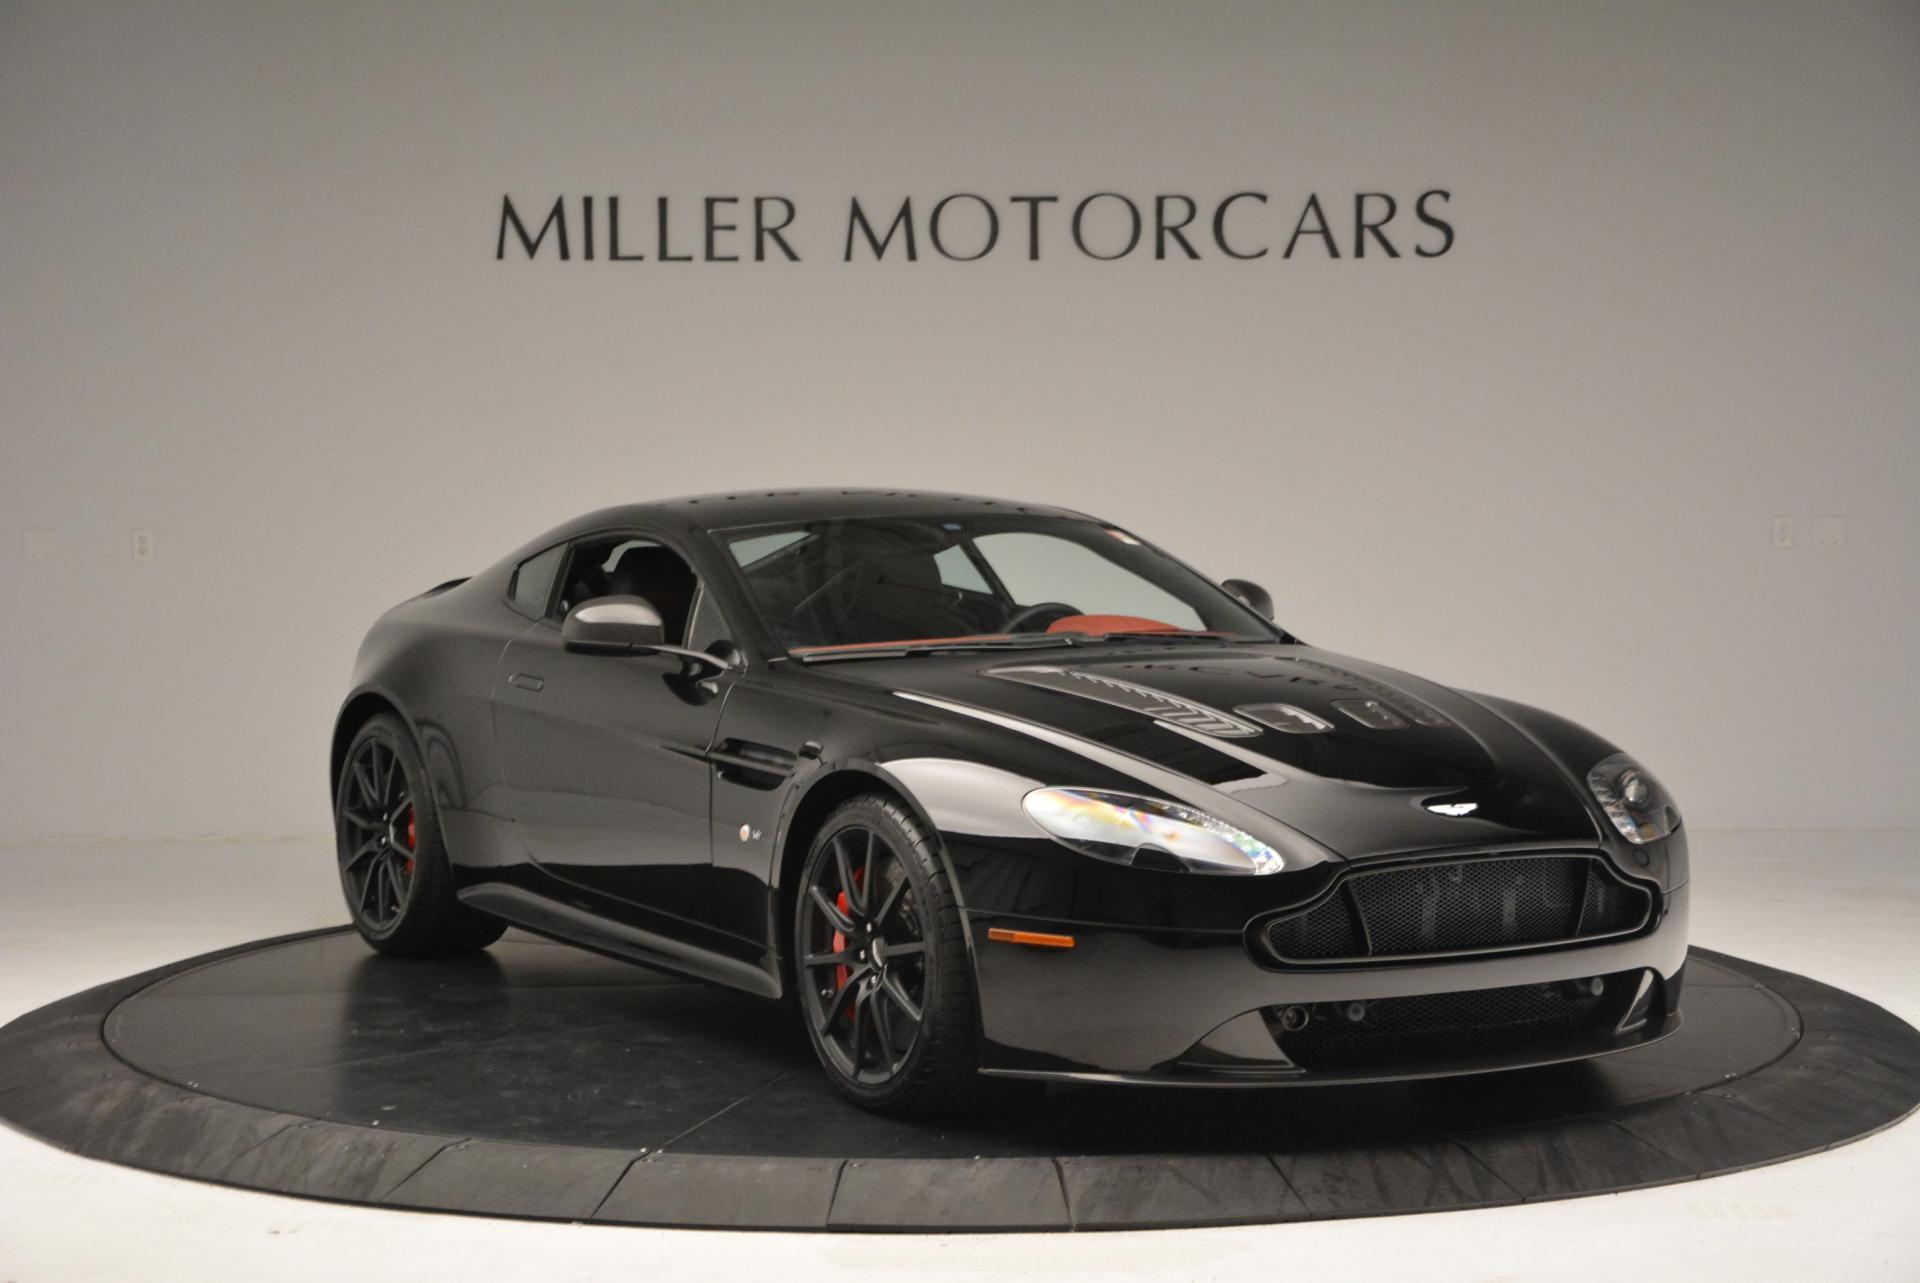 New 2015 Aston Martin V12 Vantage S